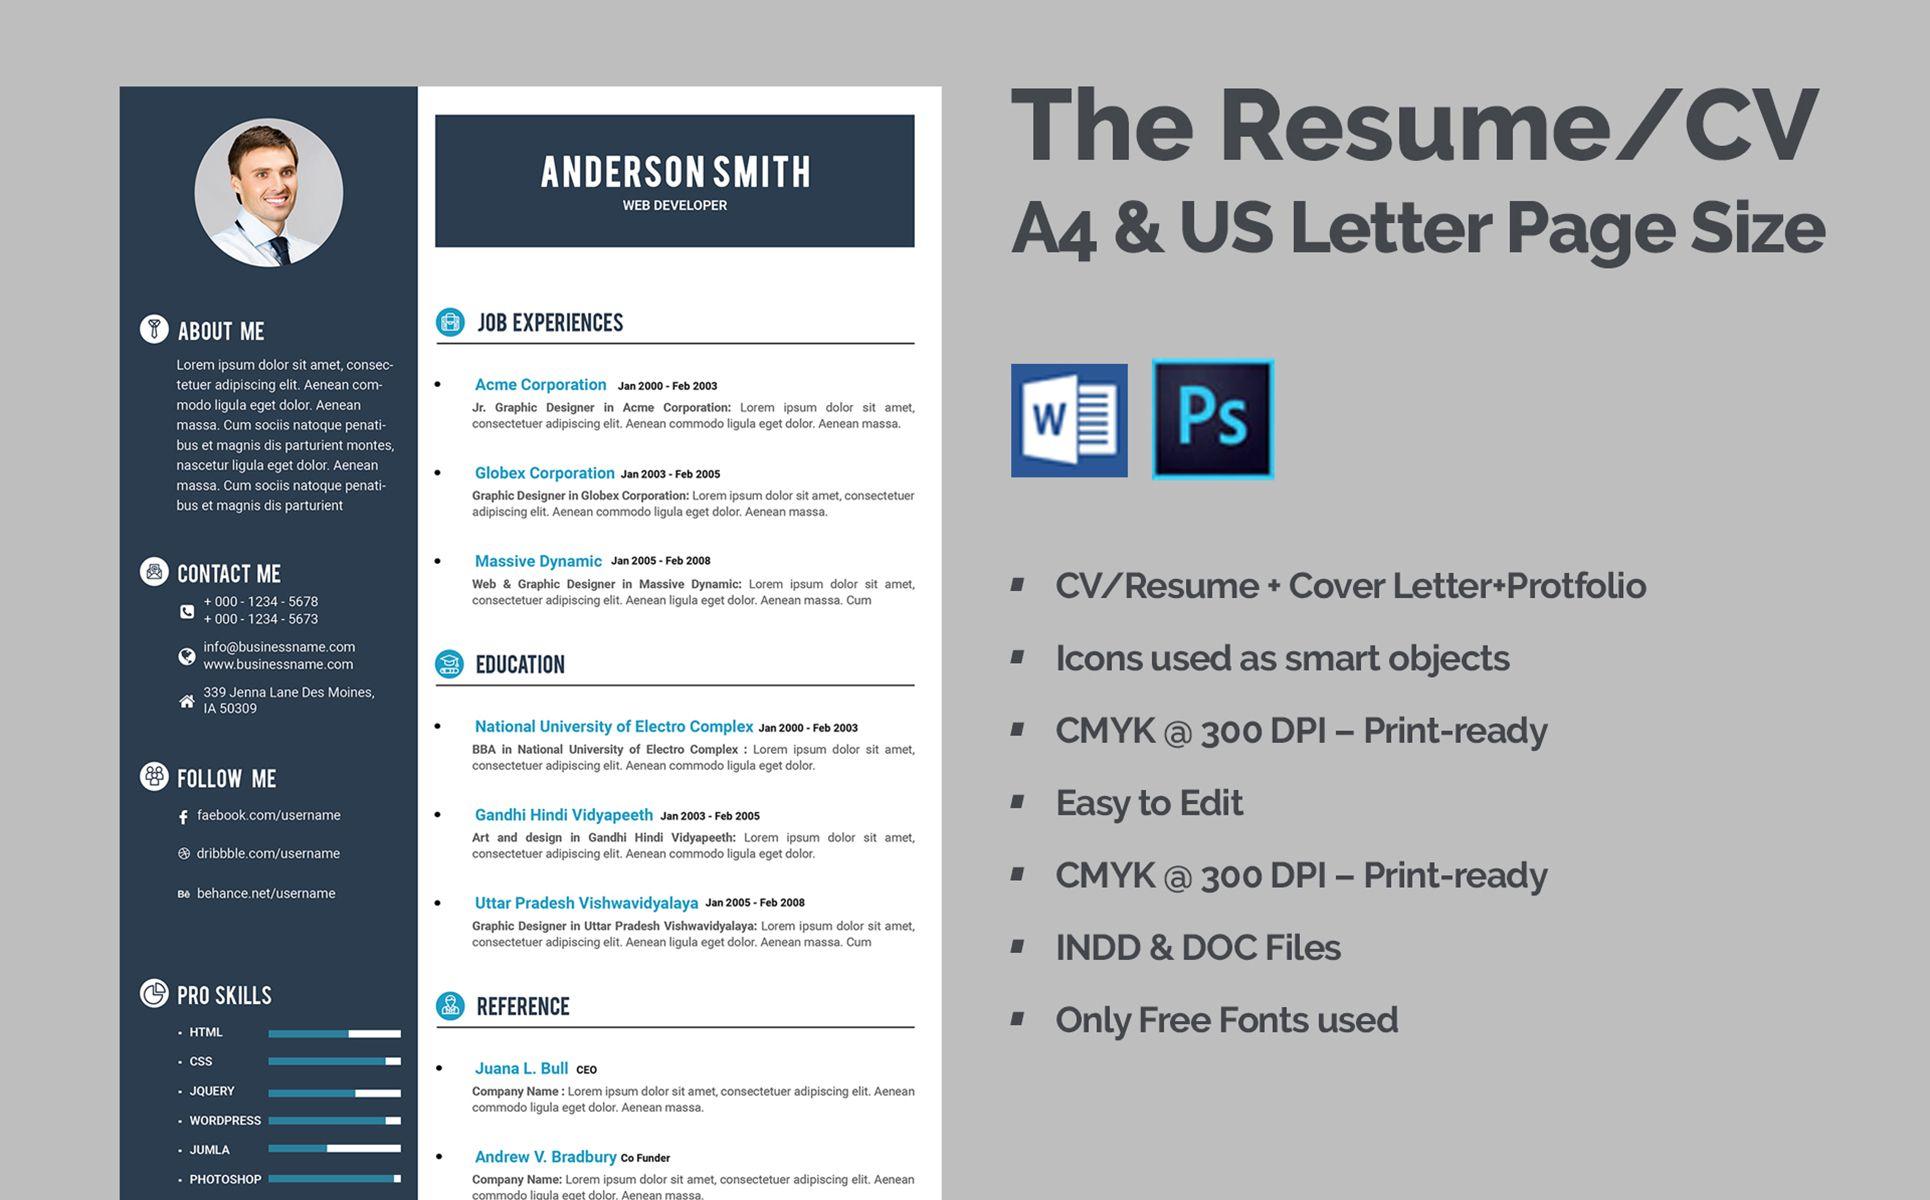 Web Developer Cv Resume Template 68317 Templatemonster Web Developer Resume Cv Resume Template Resume Cv